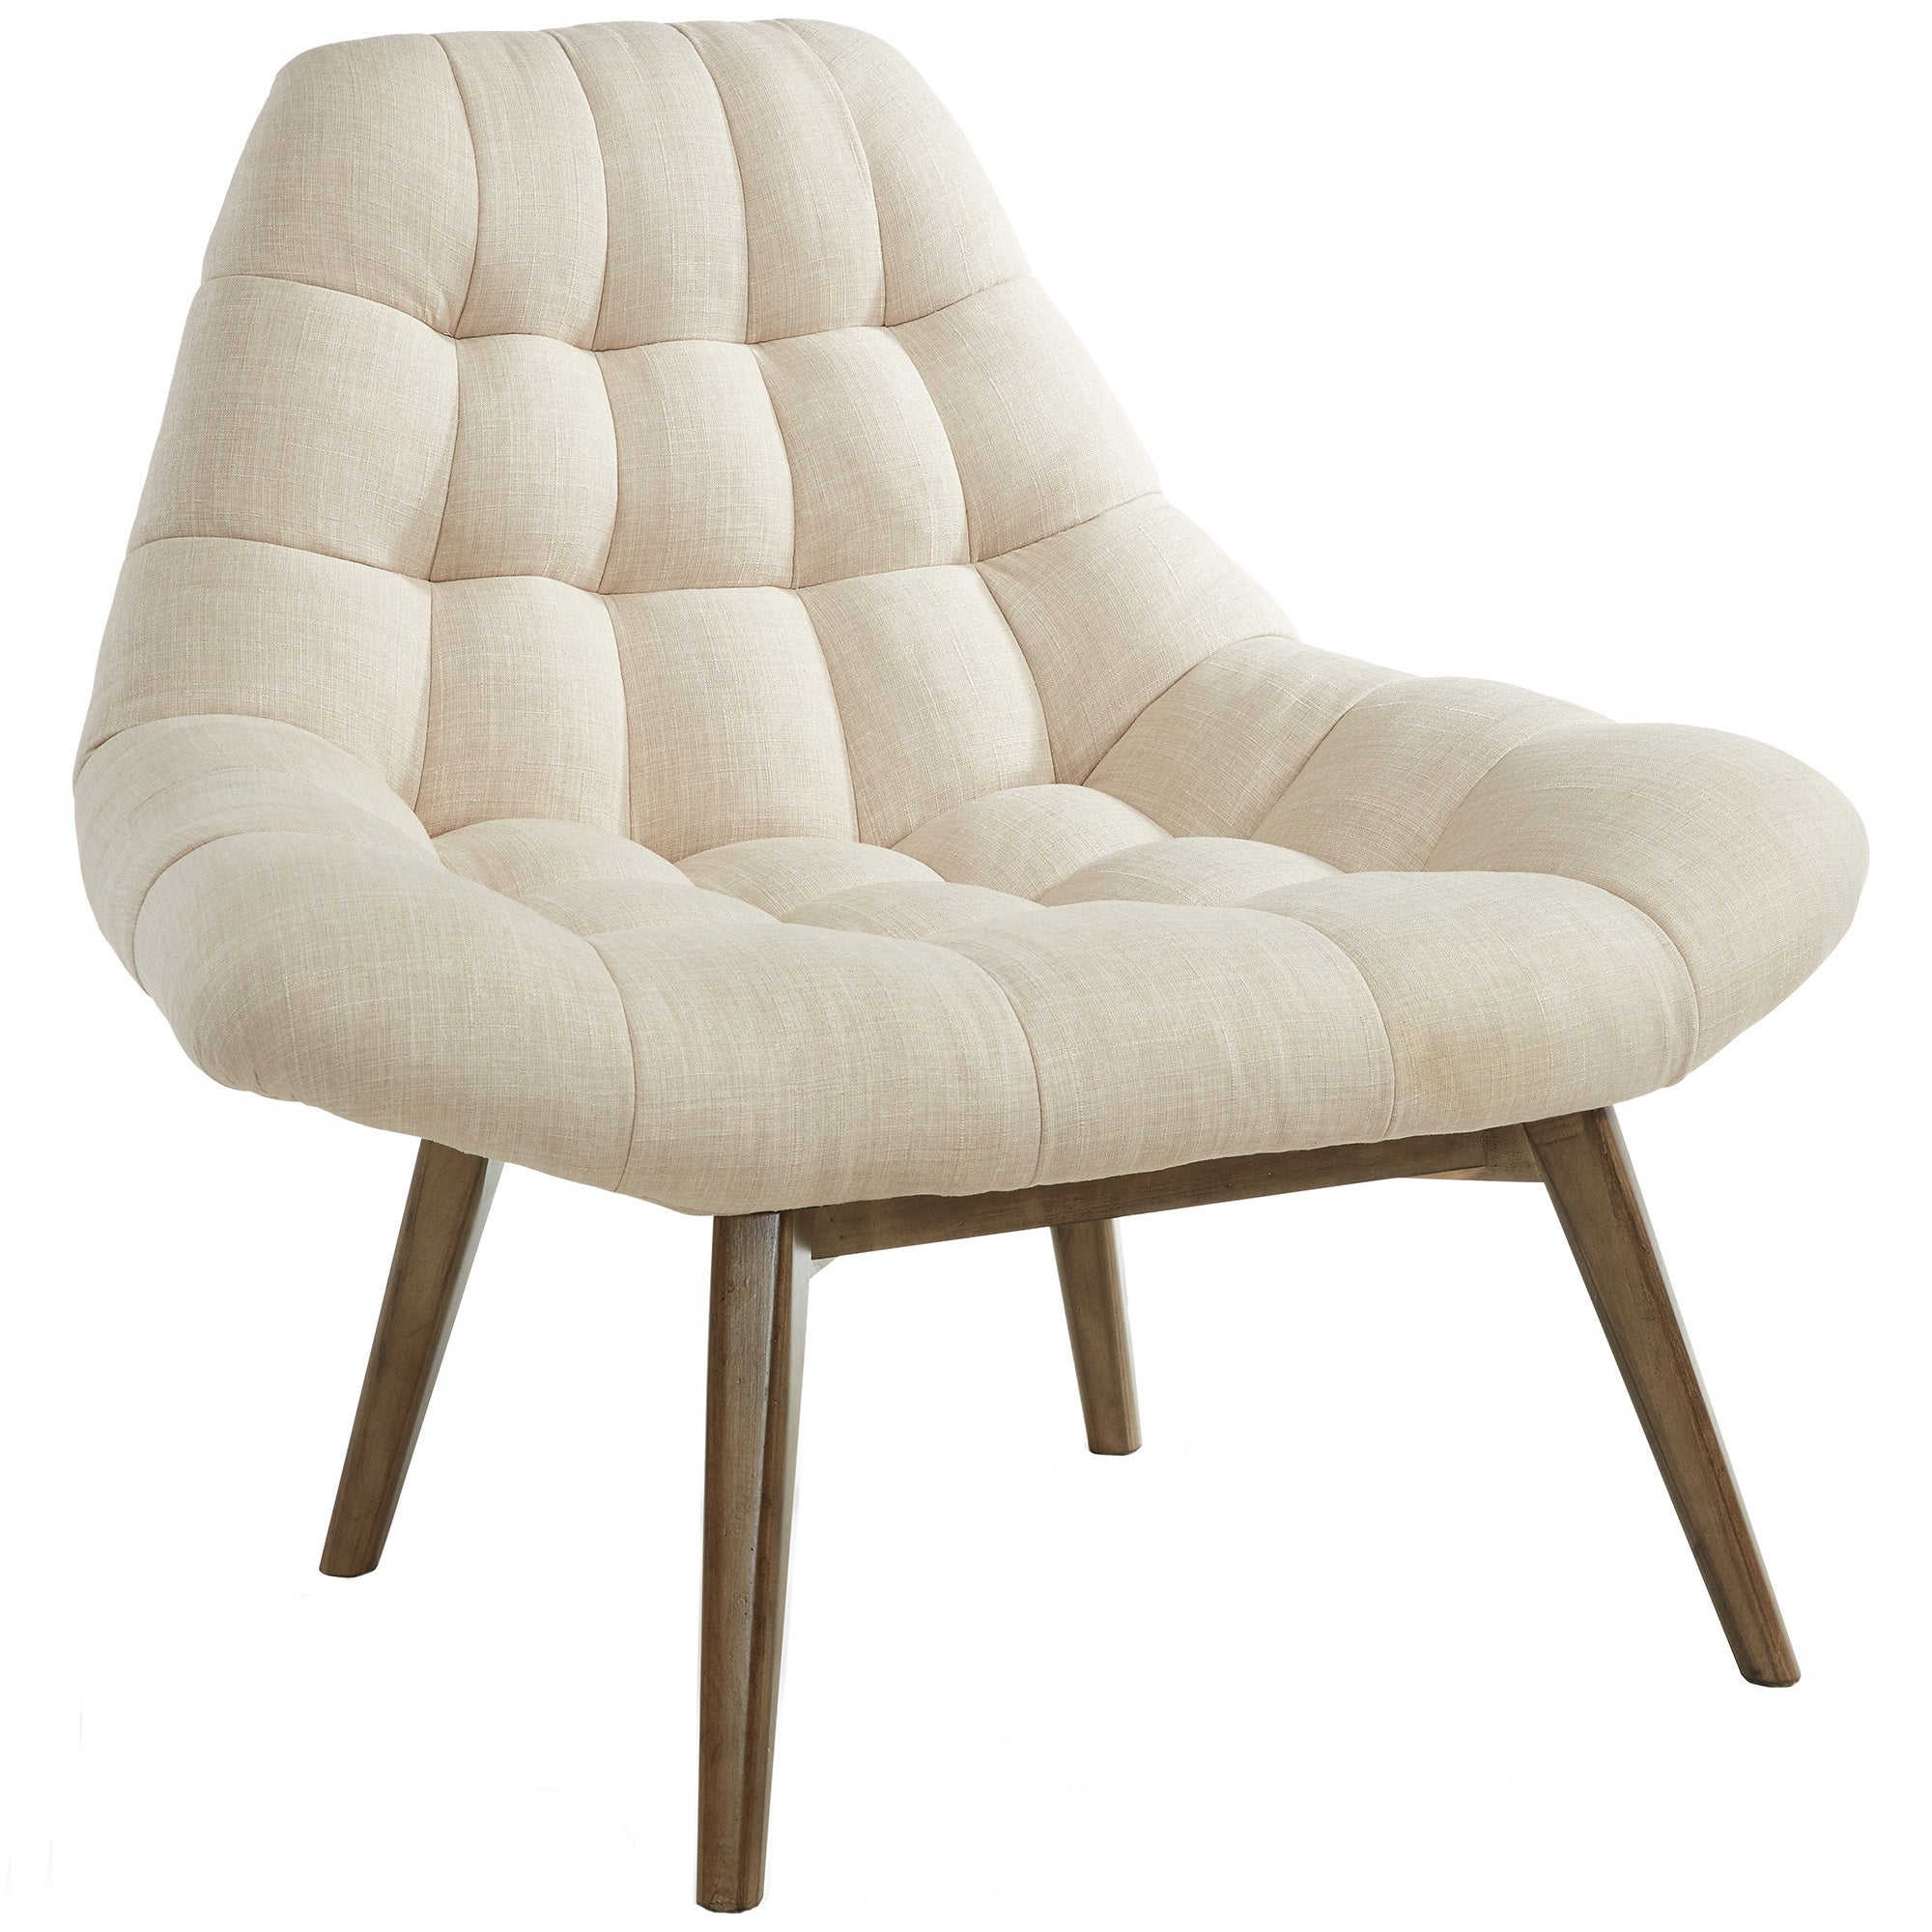 Phenomenal Oasis Oversize Waffle Tufted Fabric Accent Chair Inzonedesignstudio Interior Chair Design Inzonedesignstudiocom